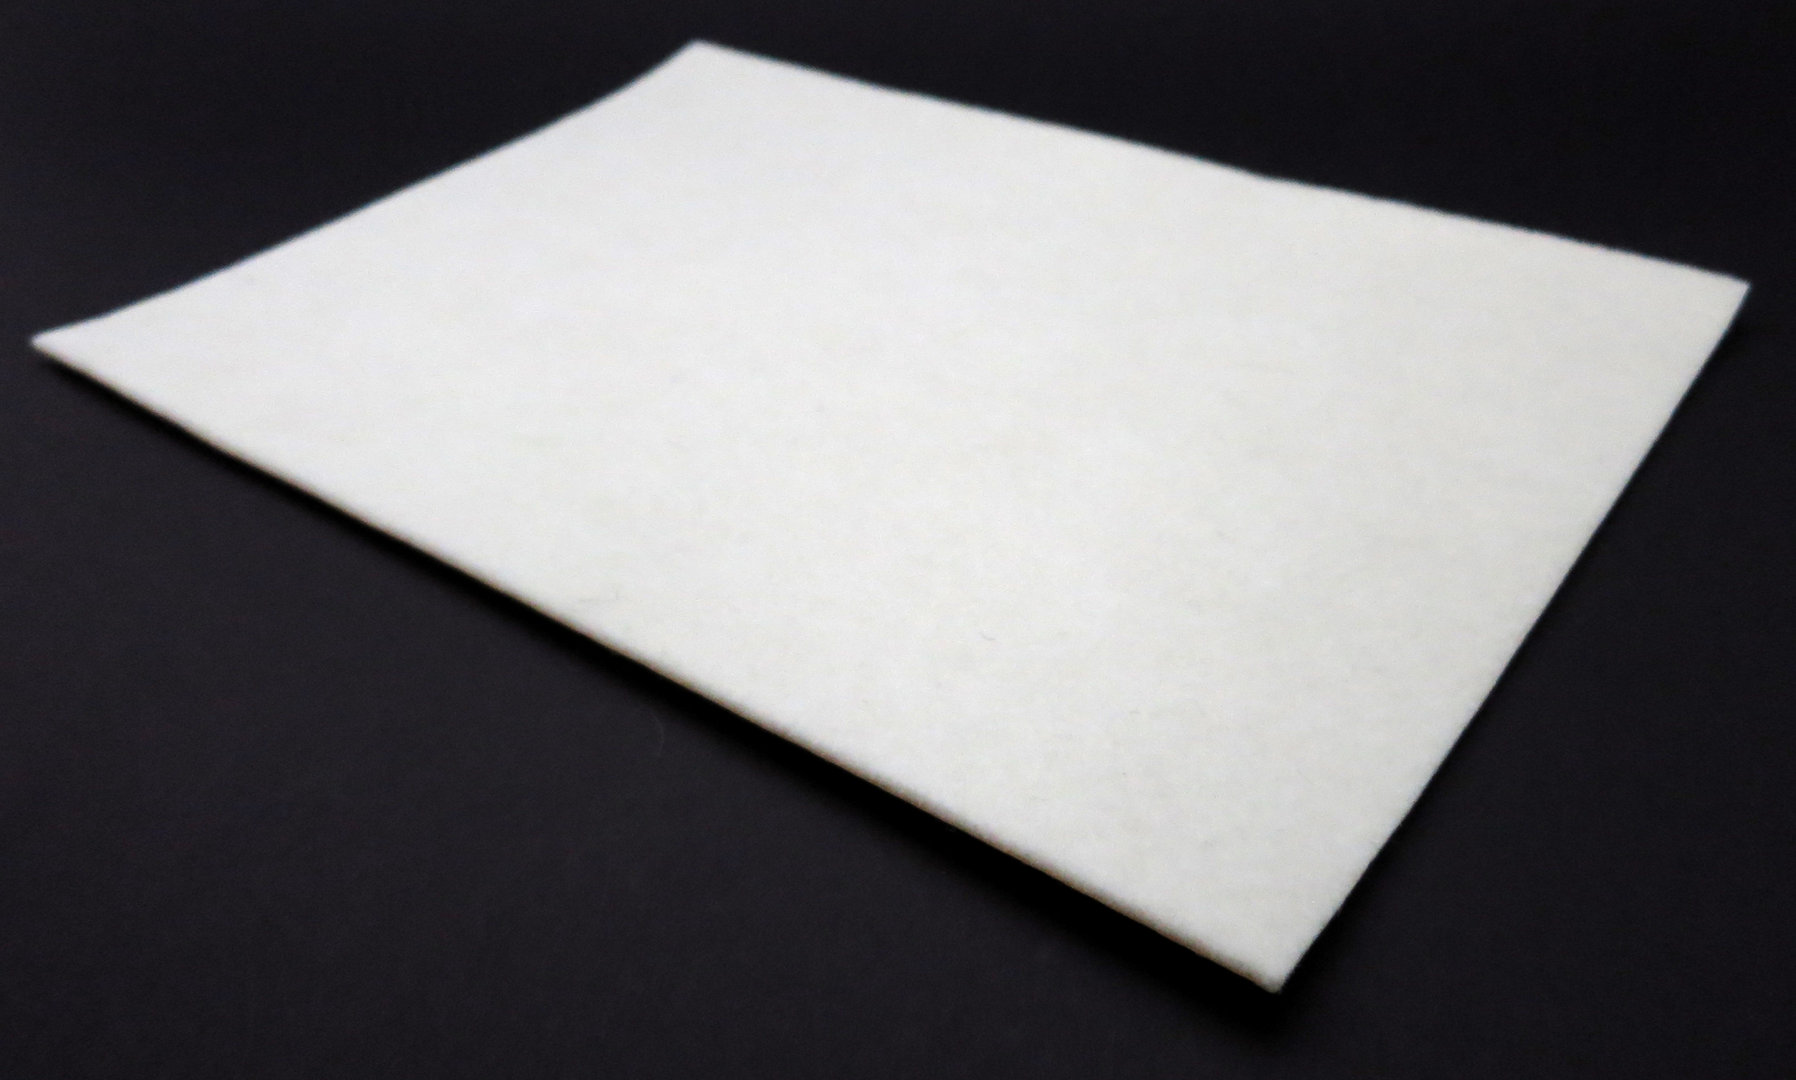 Filzgleiter quadratisch ab 5x5cm, 2mm dick   selbstklebend   weiß